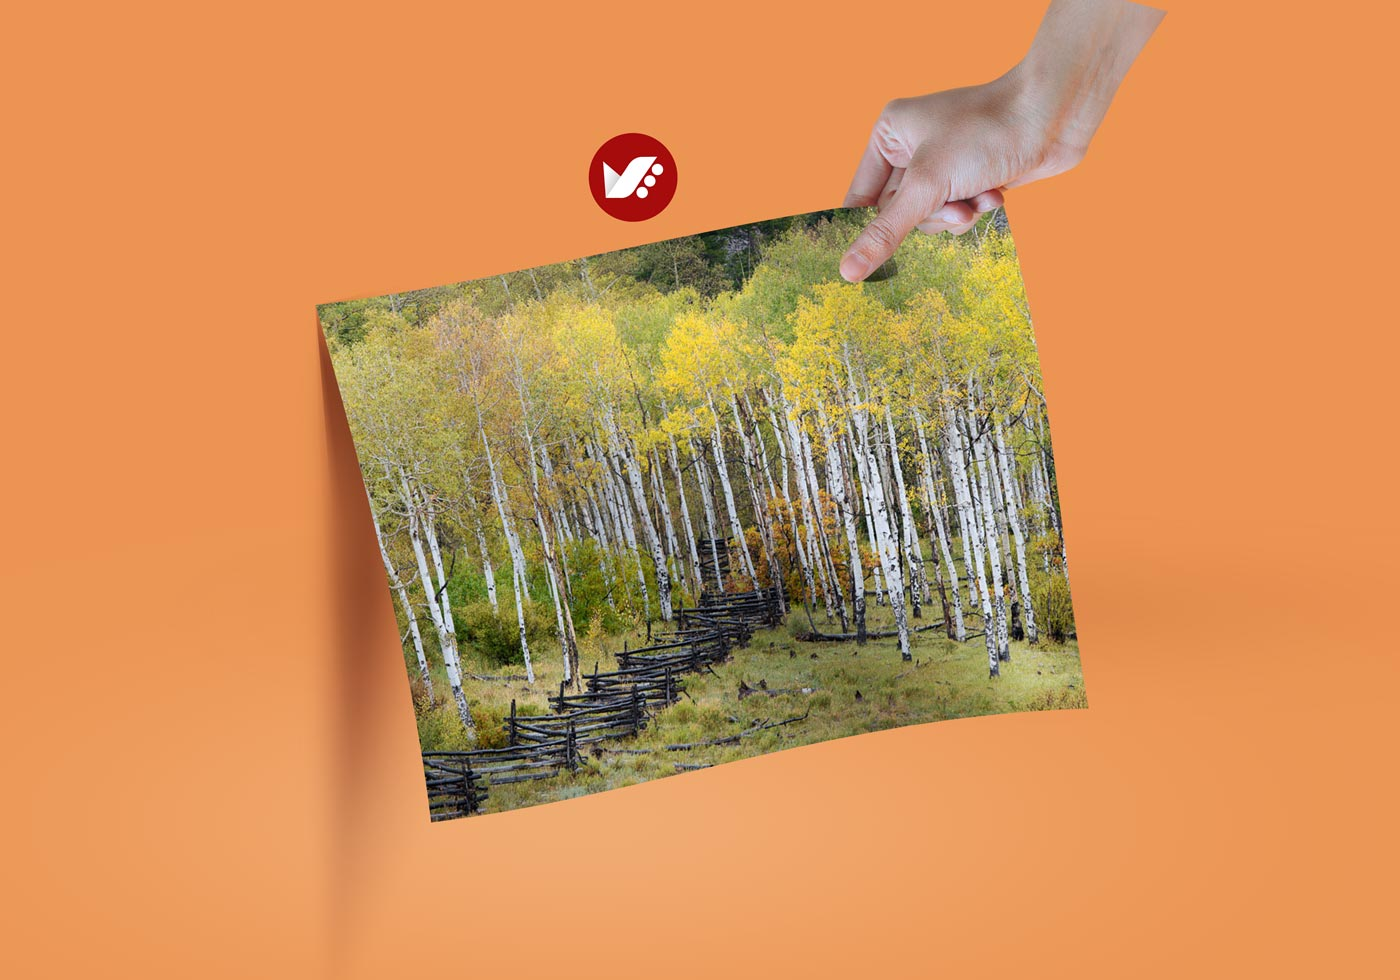 Shutter Shoc Effect on Image Quality - شاتر پرده جلو الکترونیکی